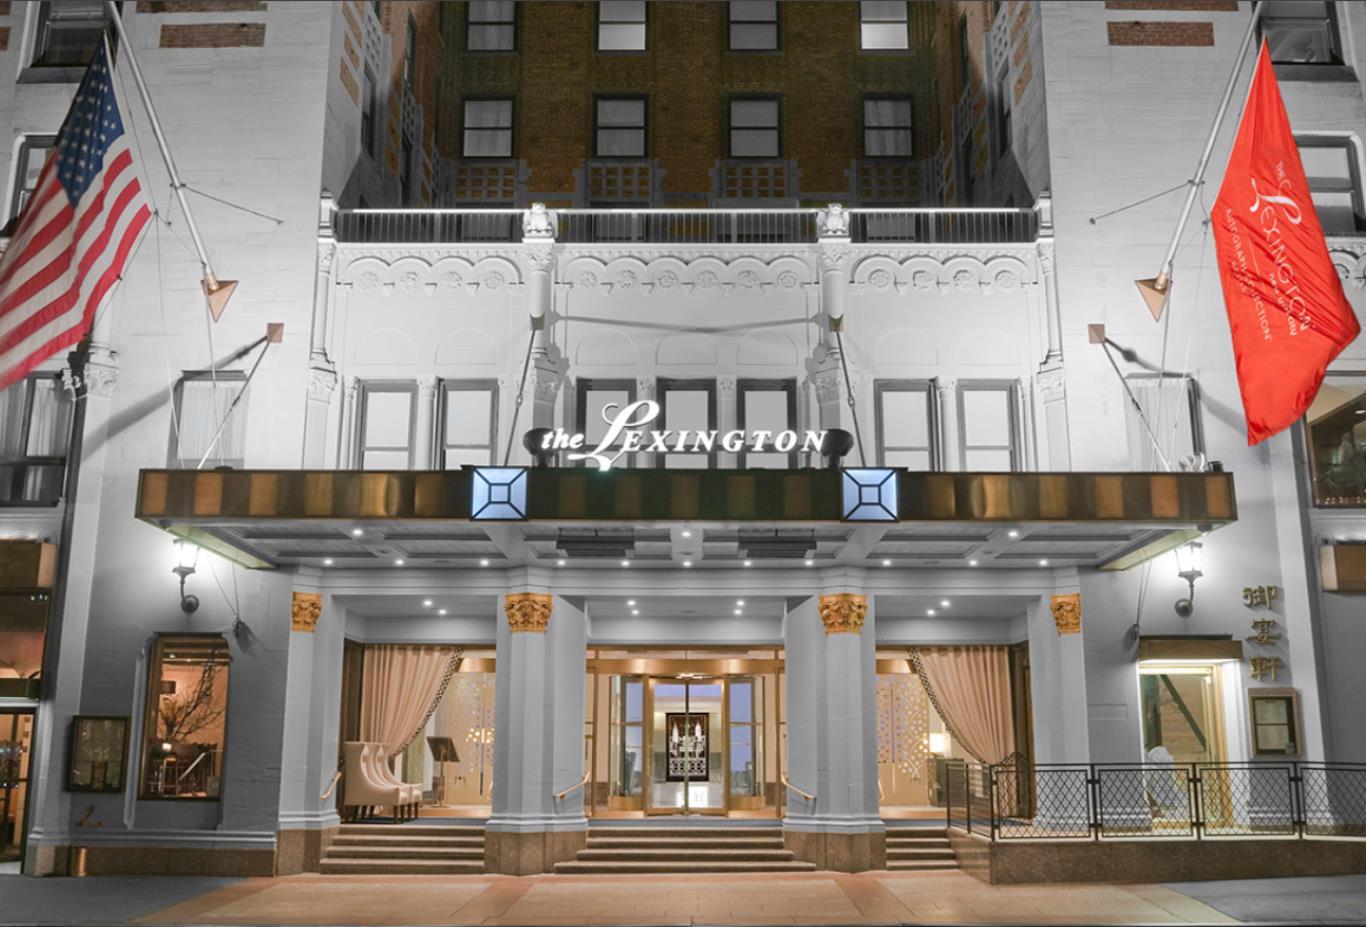 The Lexington Hotel